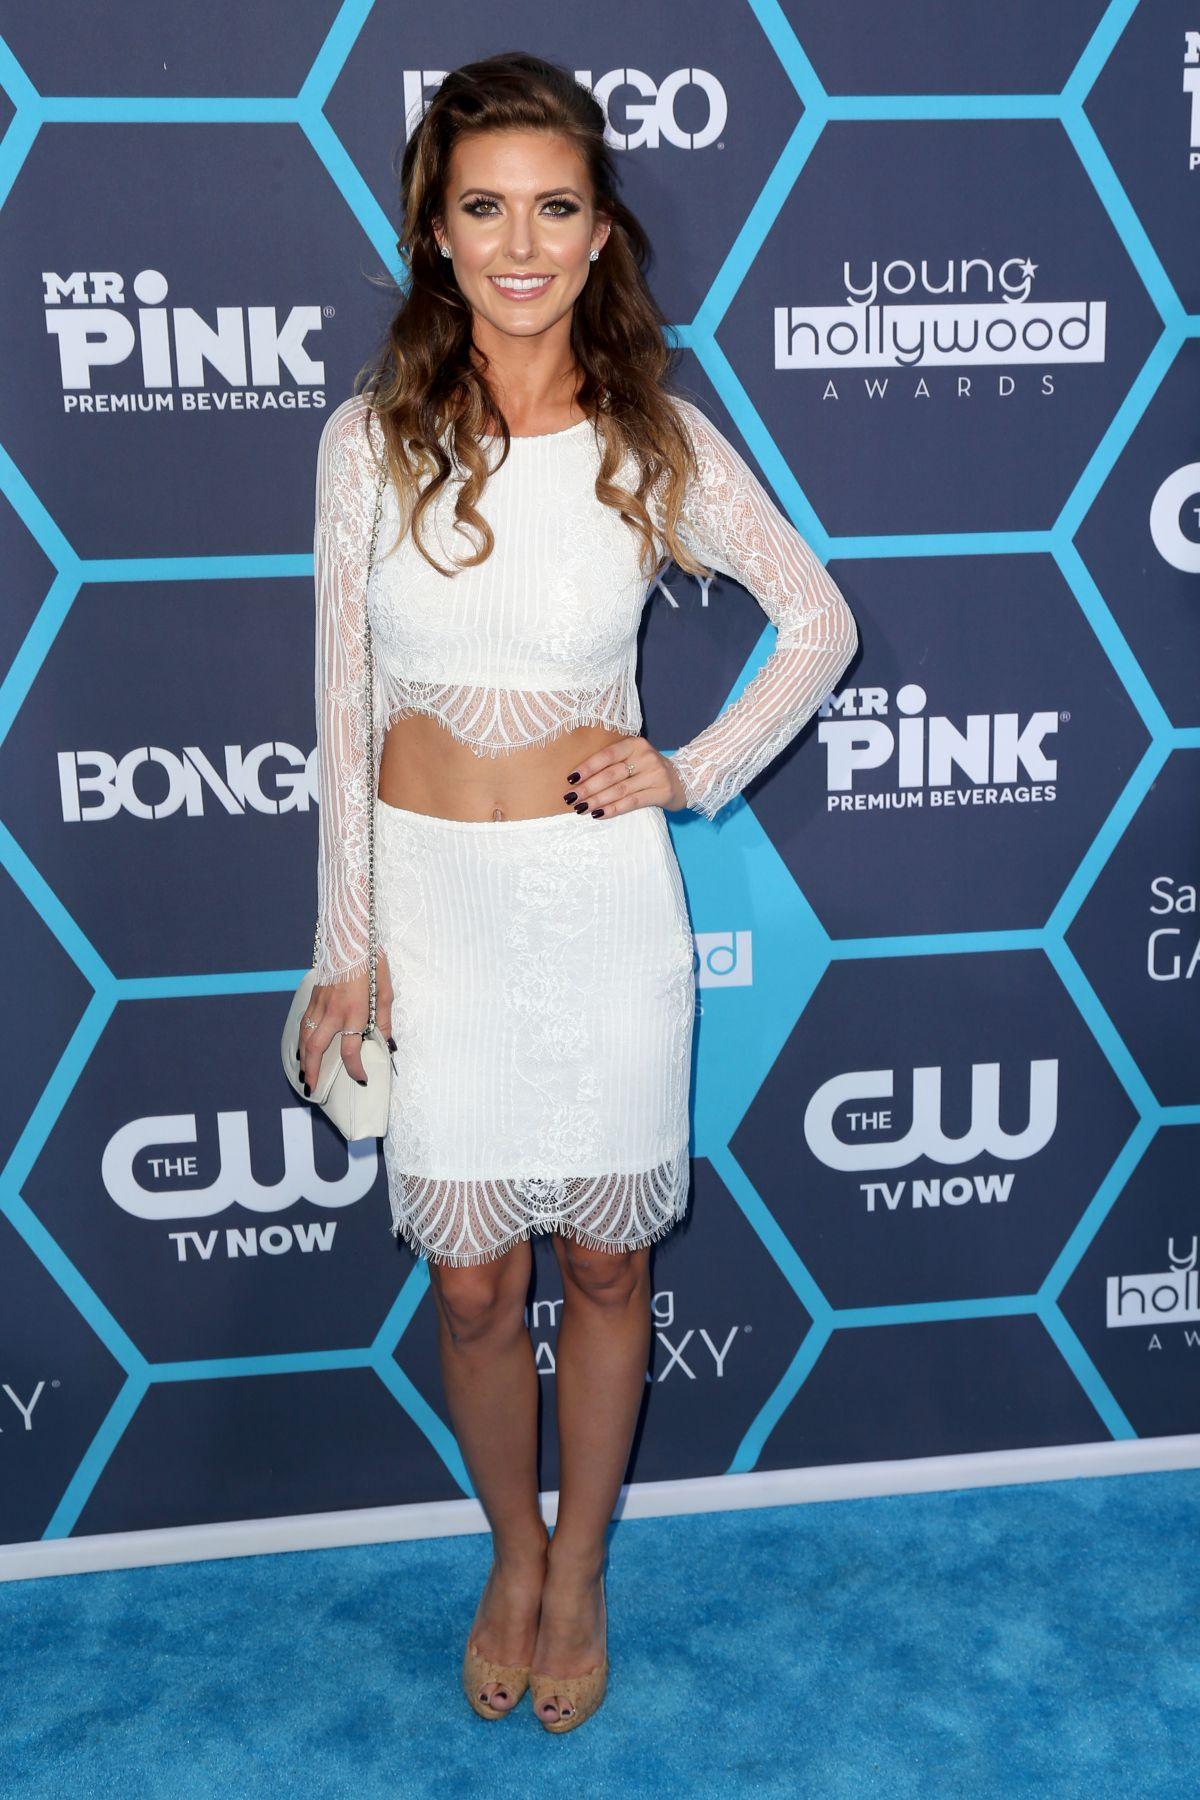 AUDRINA PATRIDGE at Young Hollywood Awards 2014 in Los Angeles